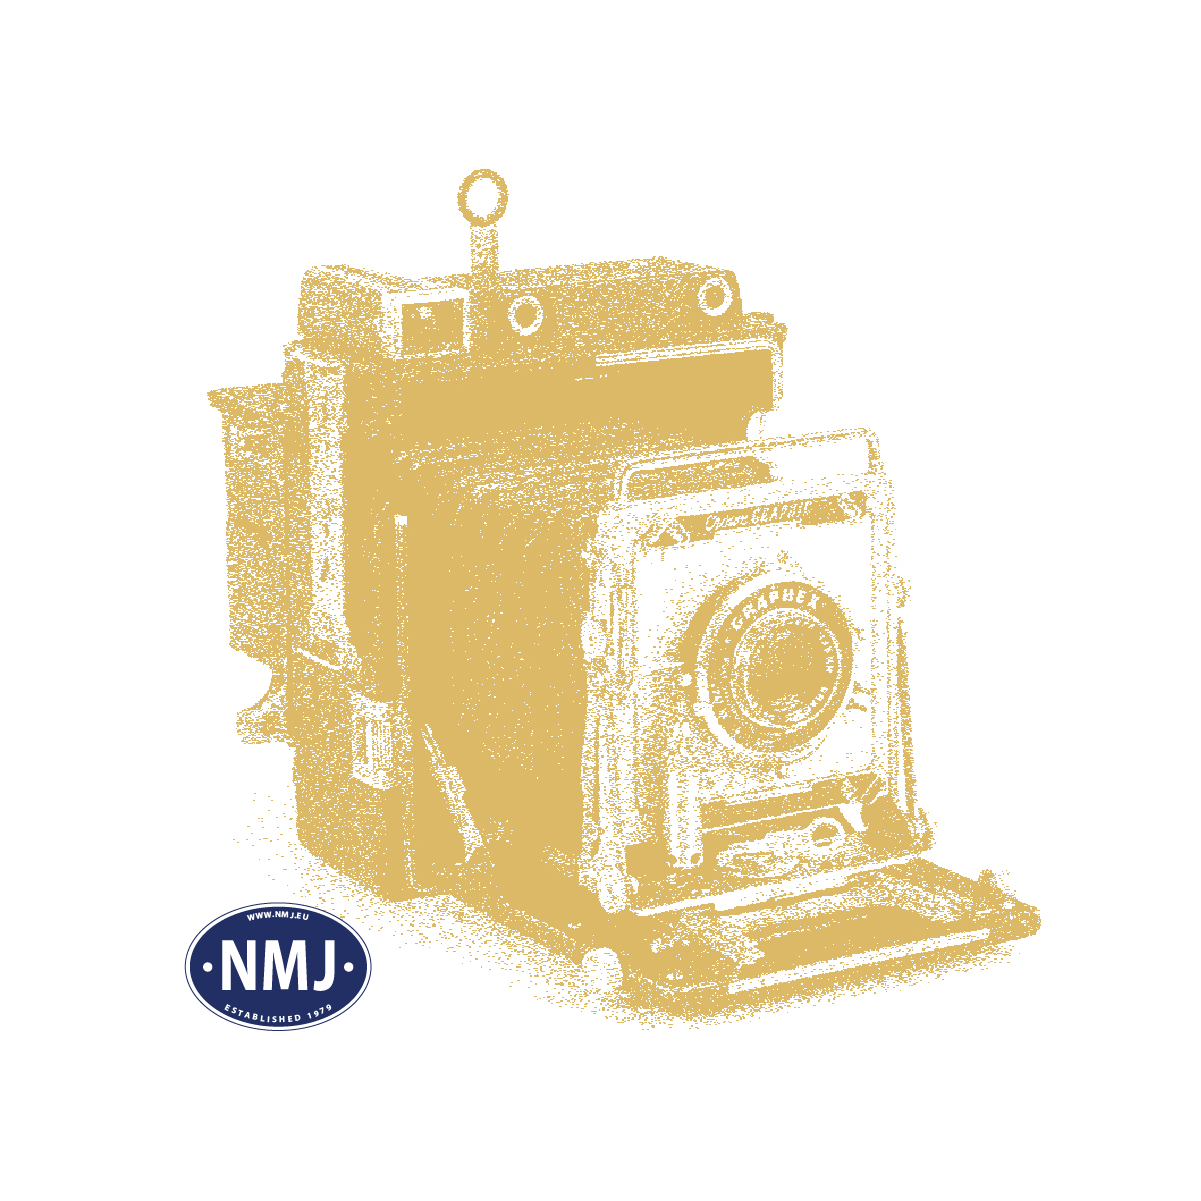 NMJSOm09969 - NMJ Superline NSB Stakevogn Om 21 76 361 0 996-9 m/ Sidelemmer